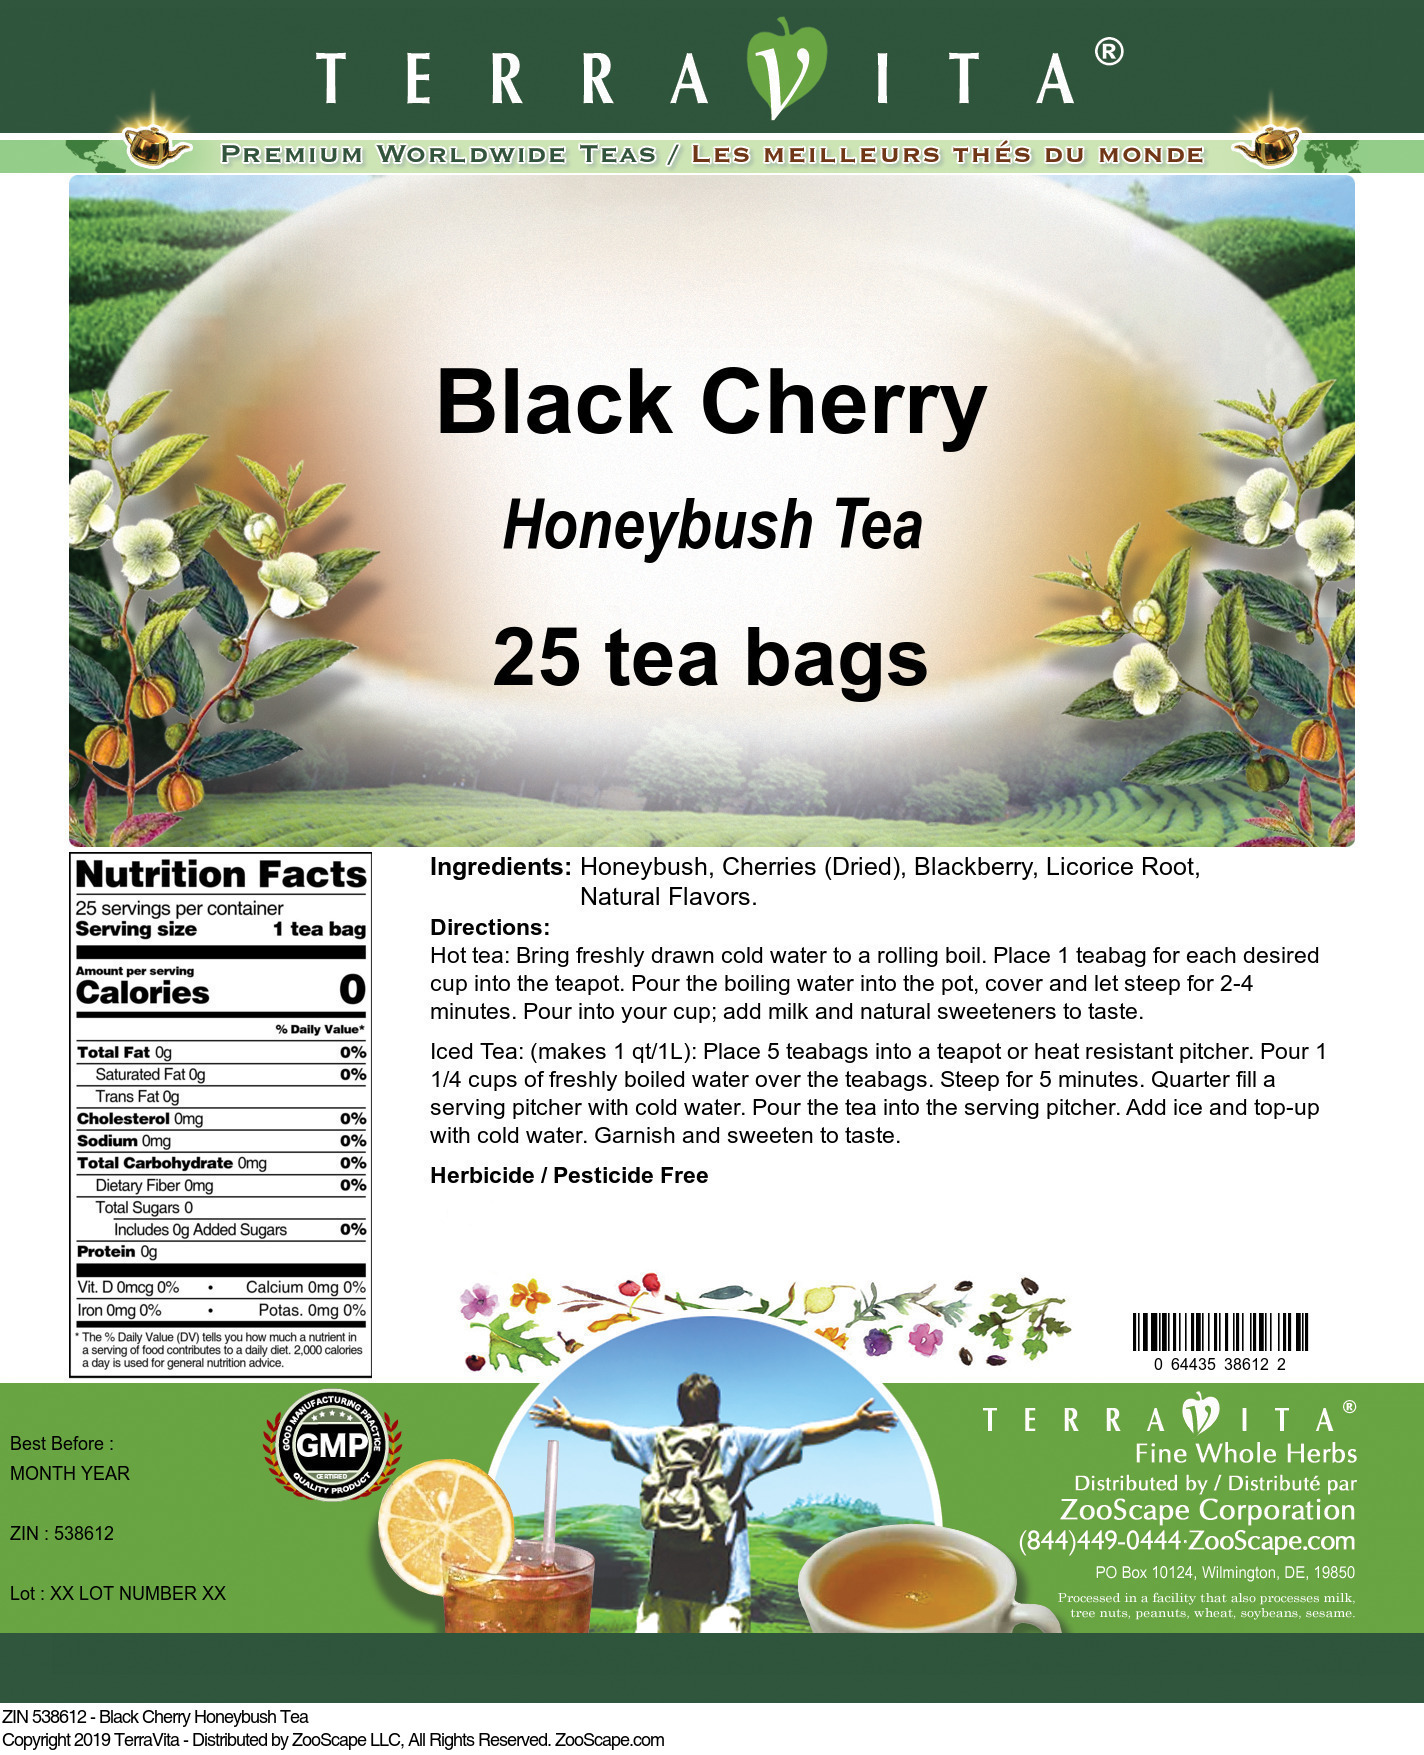 Black Cherry Honeybush Tea